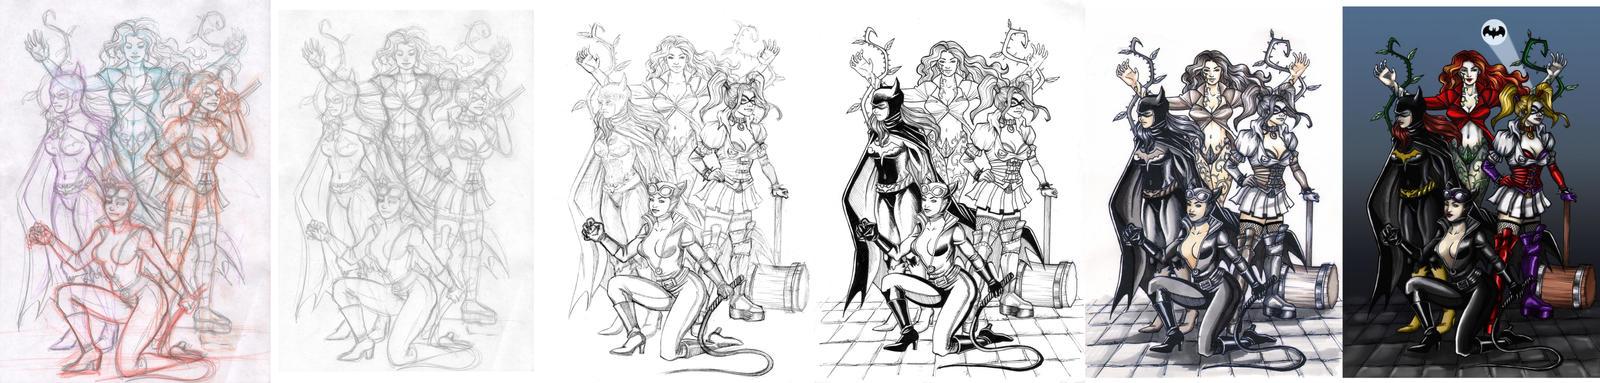 Batman girls process by Valaquia